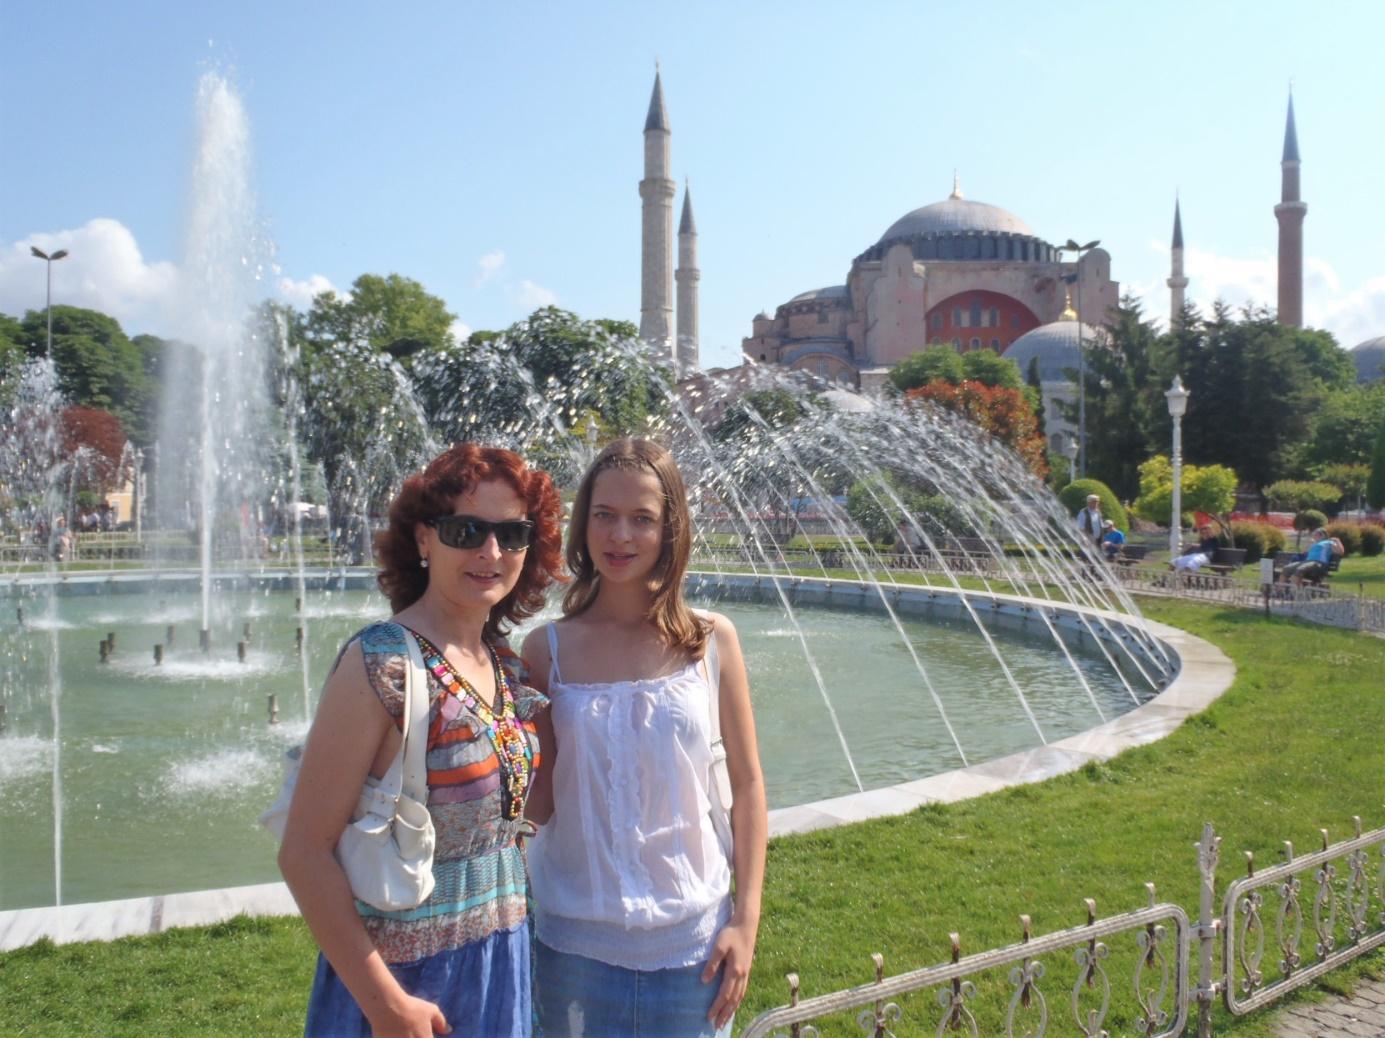 C:\Users\Administrator\Documents\Documents\Putovanja\PUTOPISI\TURSKA\3\Slike\1.jpg